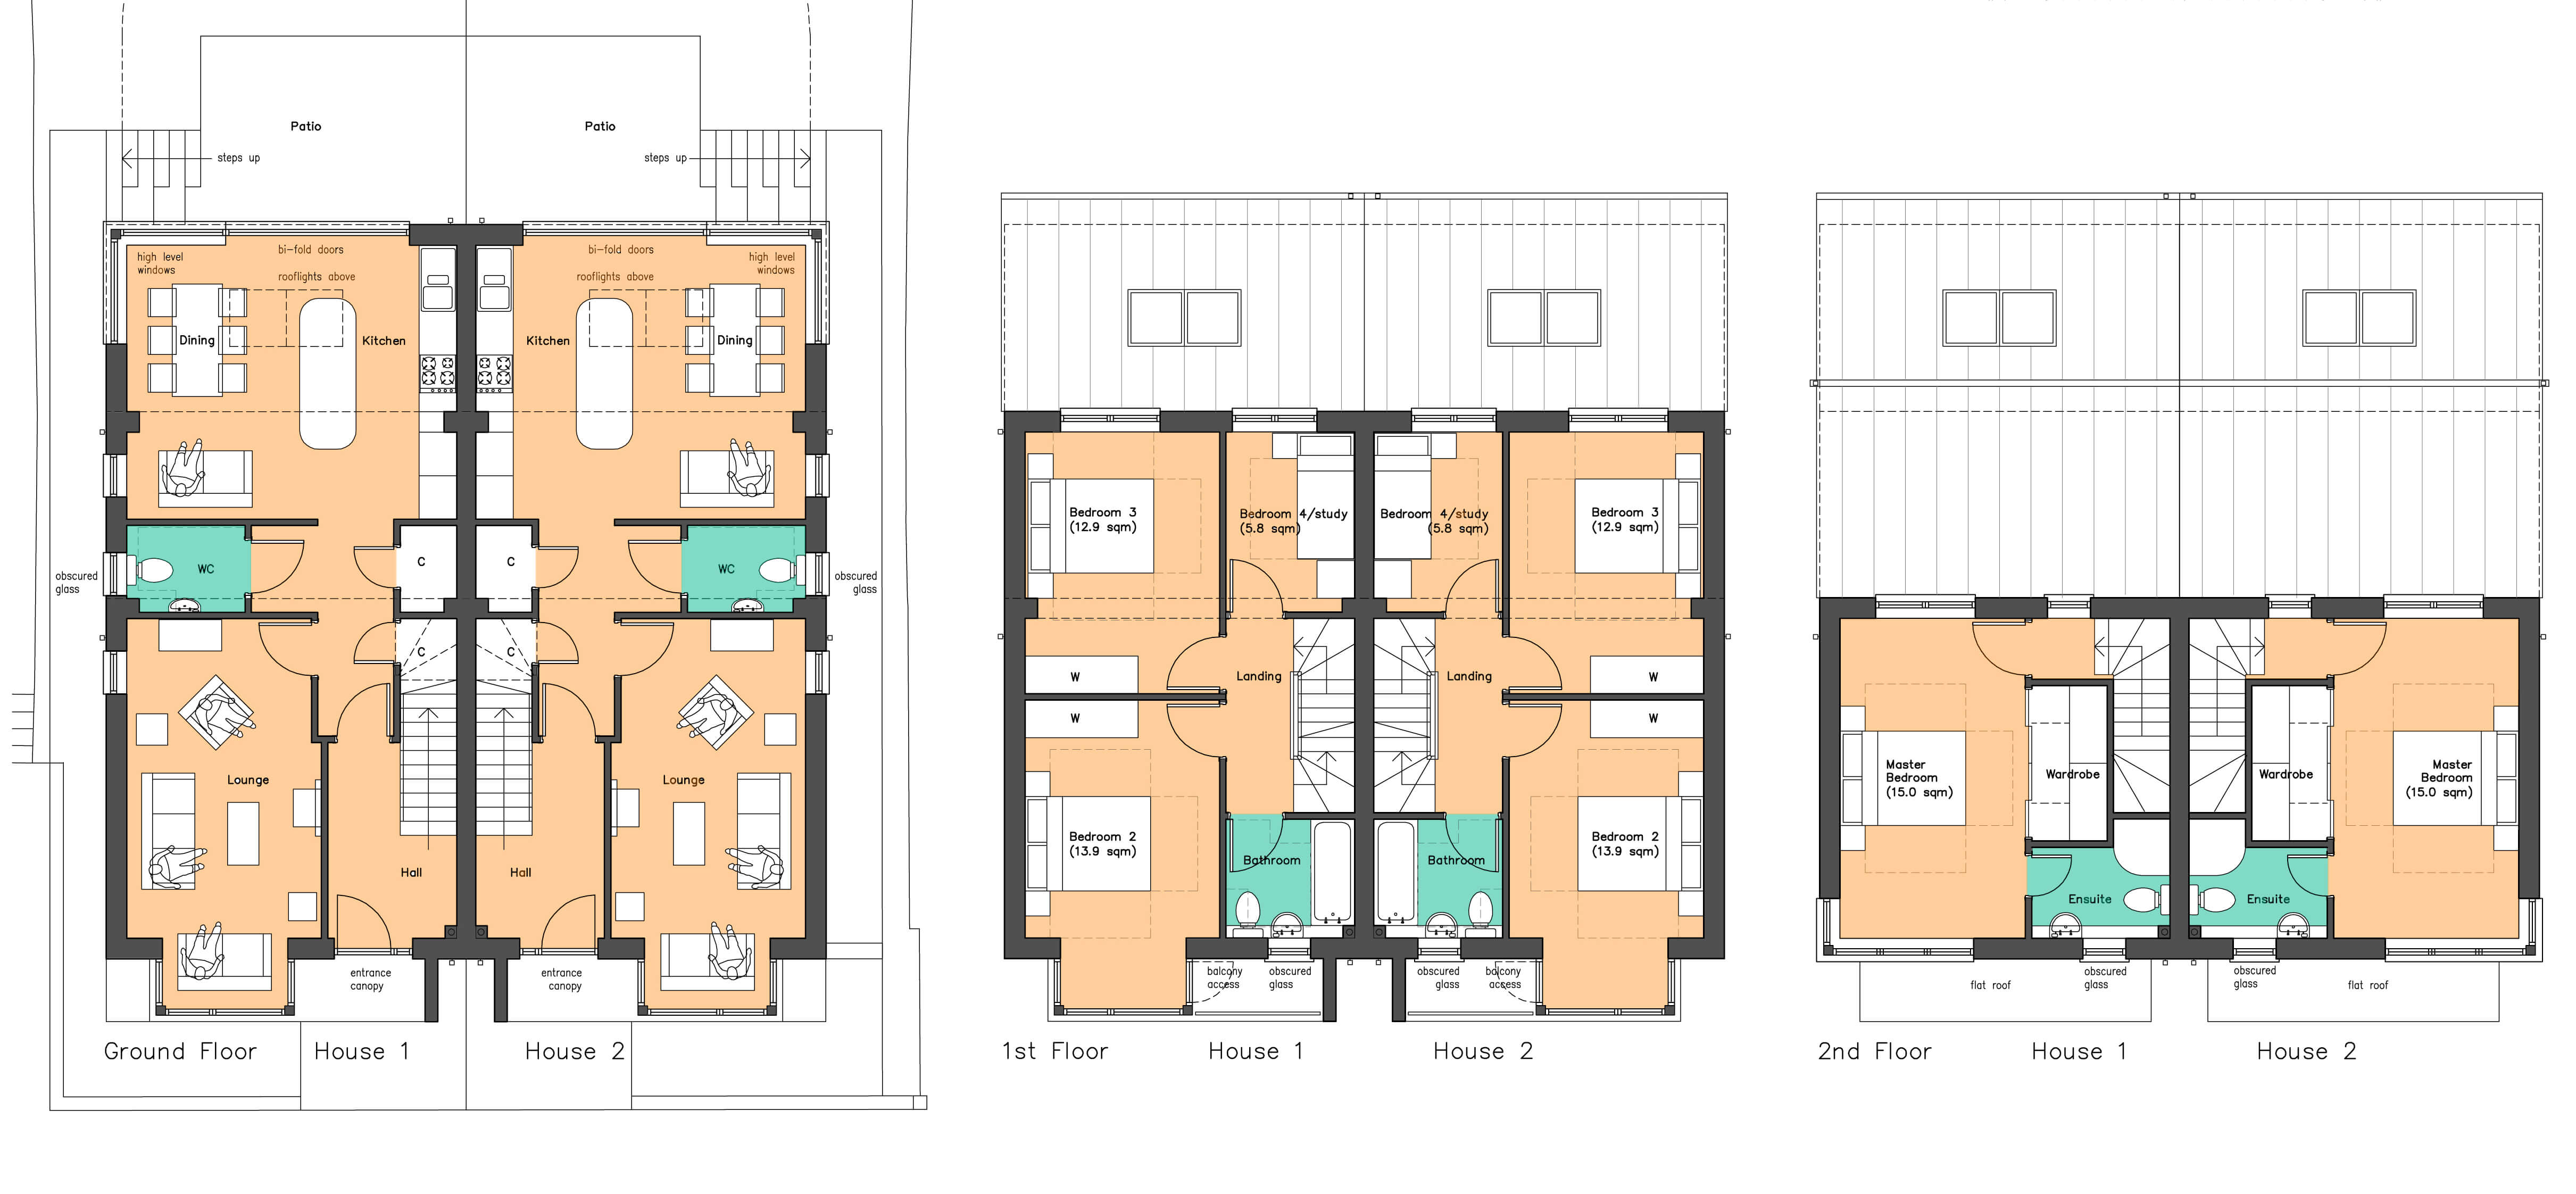 D:DocsJW Projects1802 23 Maldon Road5.1 drawings1802plans 1